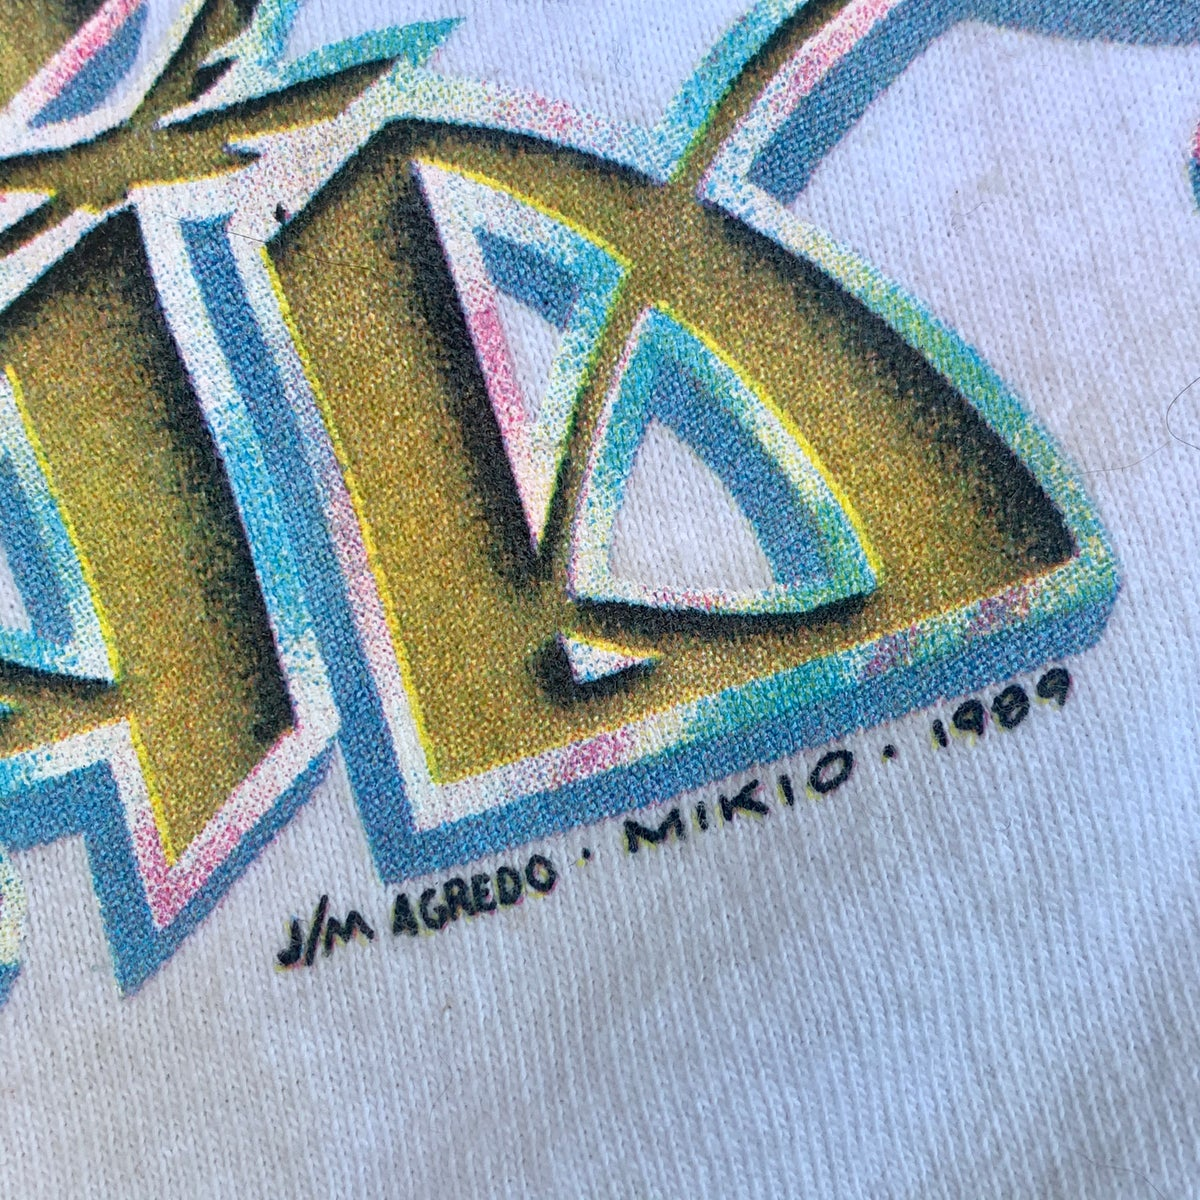 Original Vintage Grateful Dead 1989 Rainforest Tee!! XX-Large